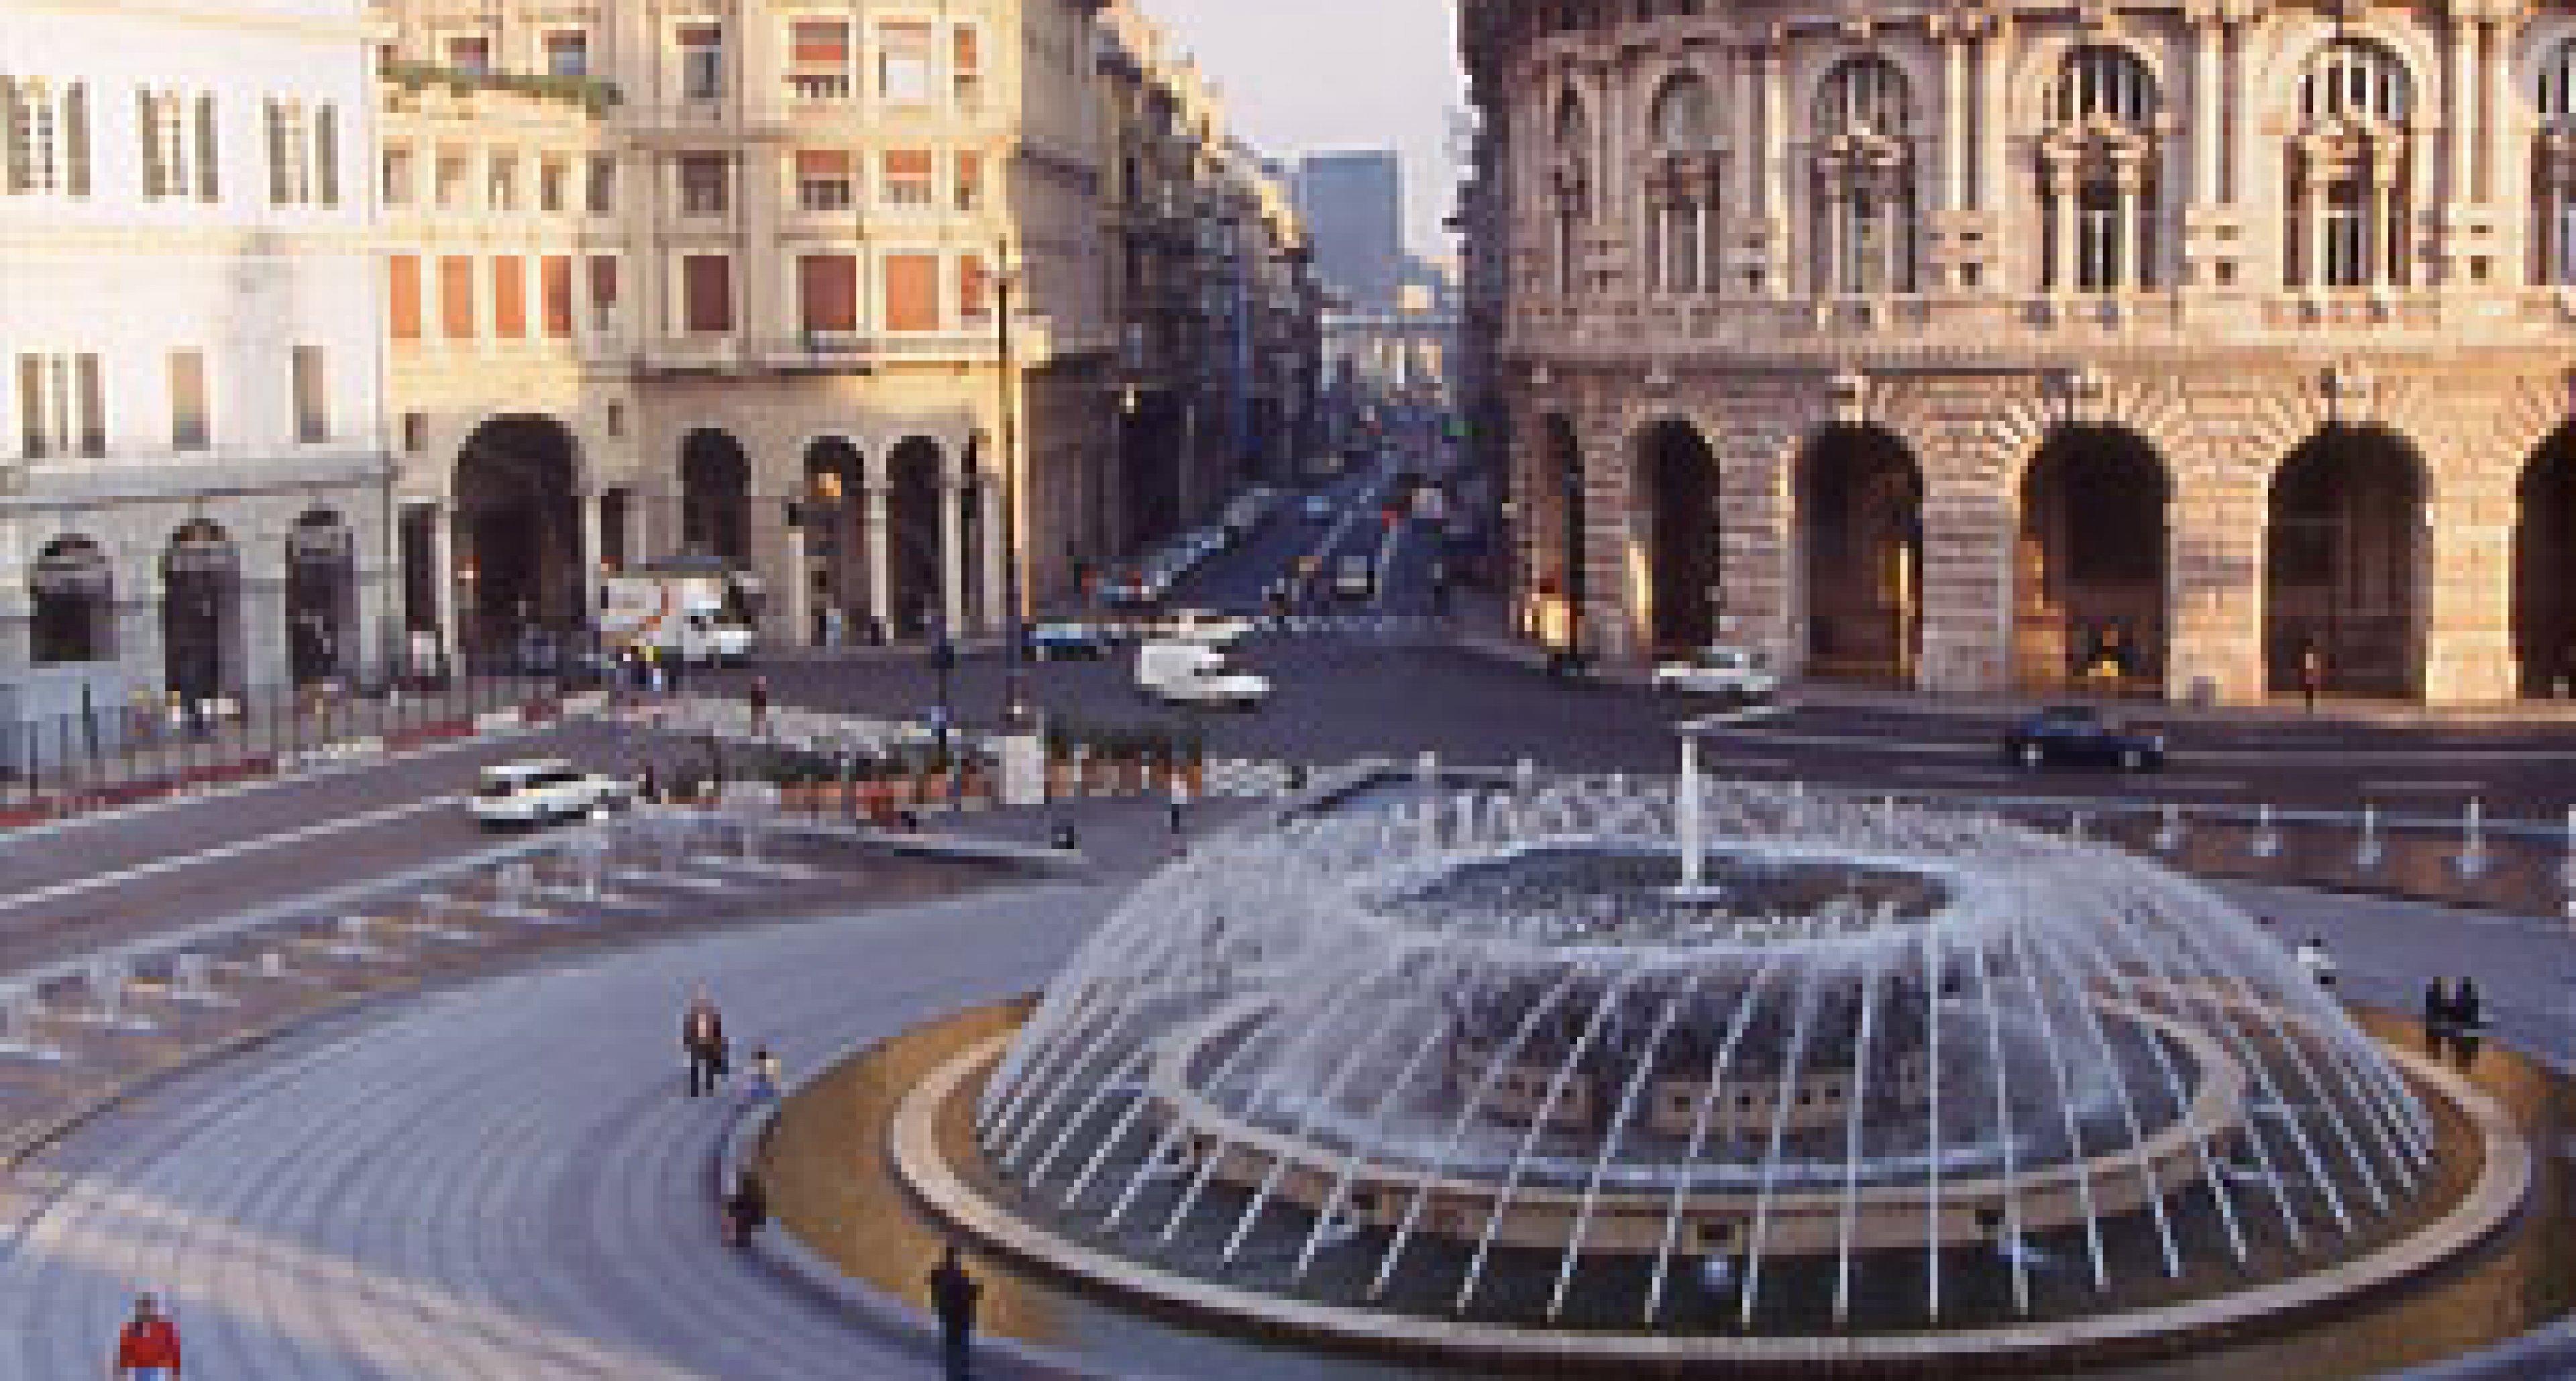 Revival des Mailand–San Remo-Pokal 2003: 180 Teilnehmer erwartet